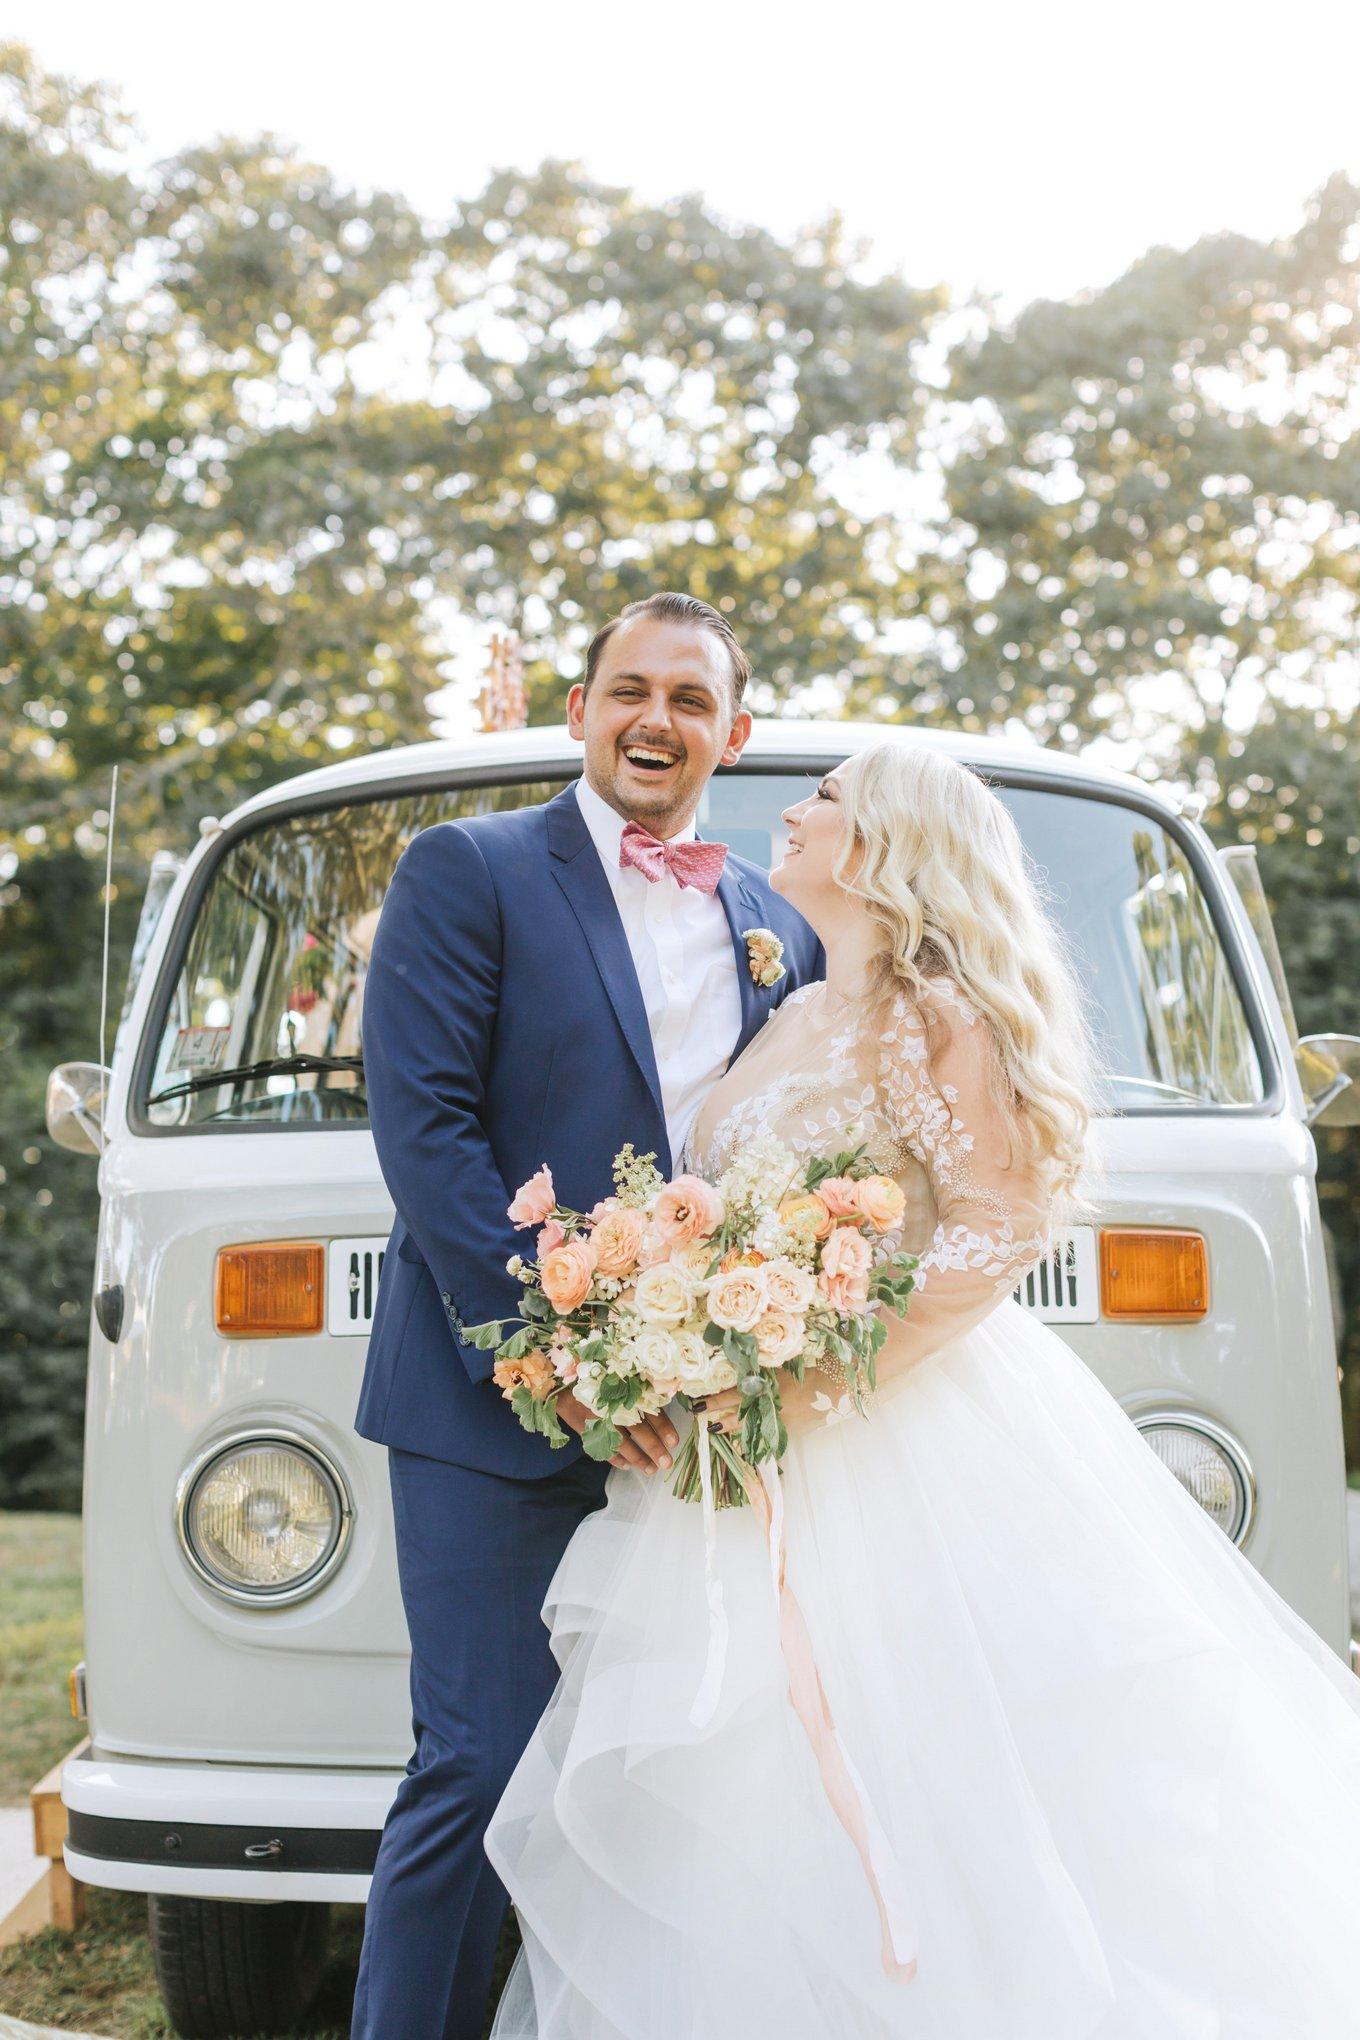 Marthas-Vineyard-Wedding-Photographer-Beach-Plum-Inn-40.jpg